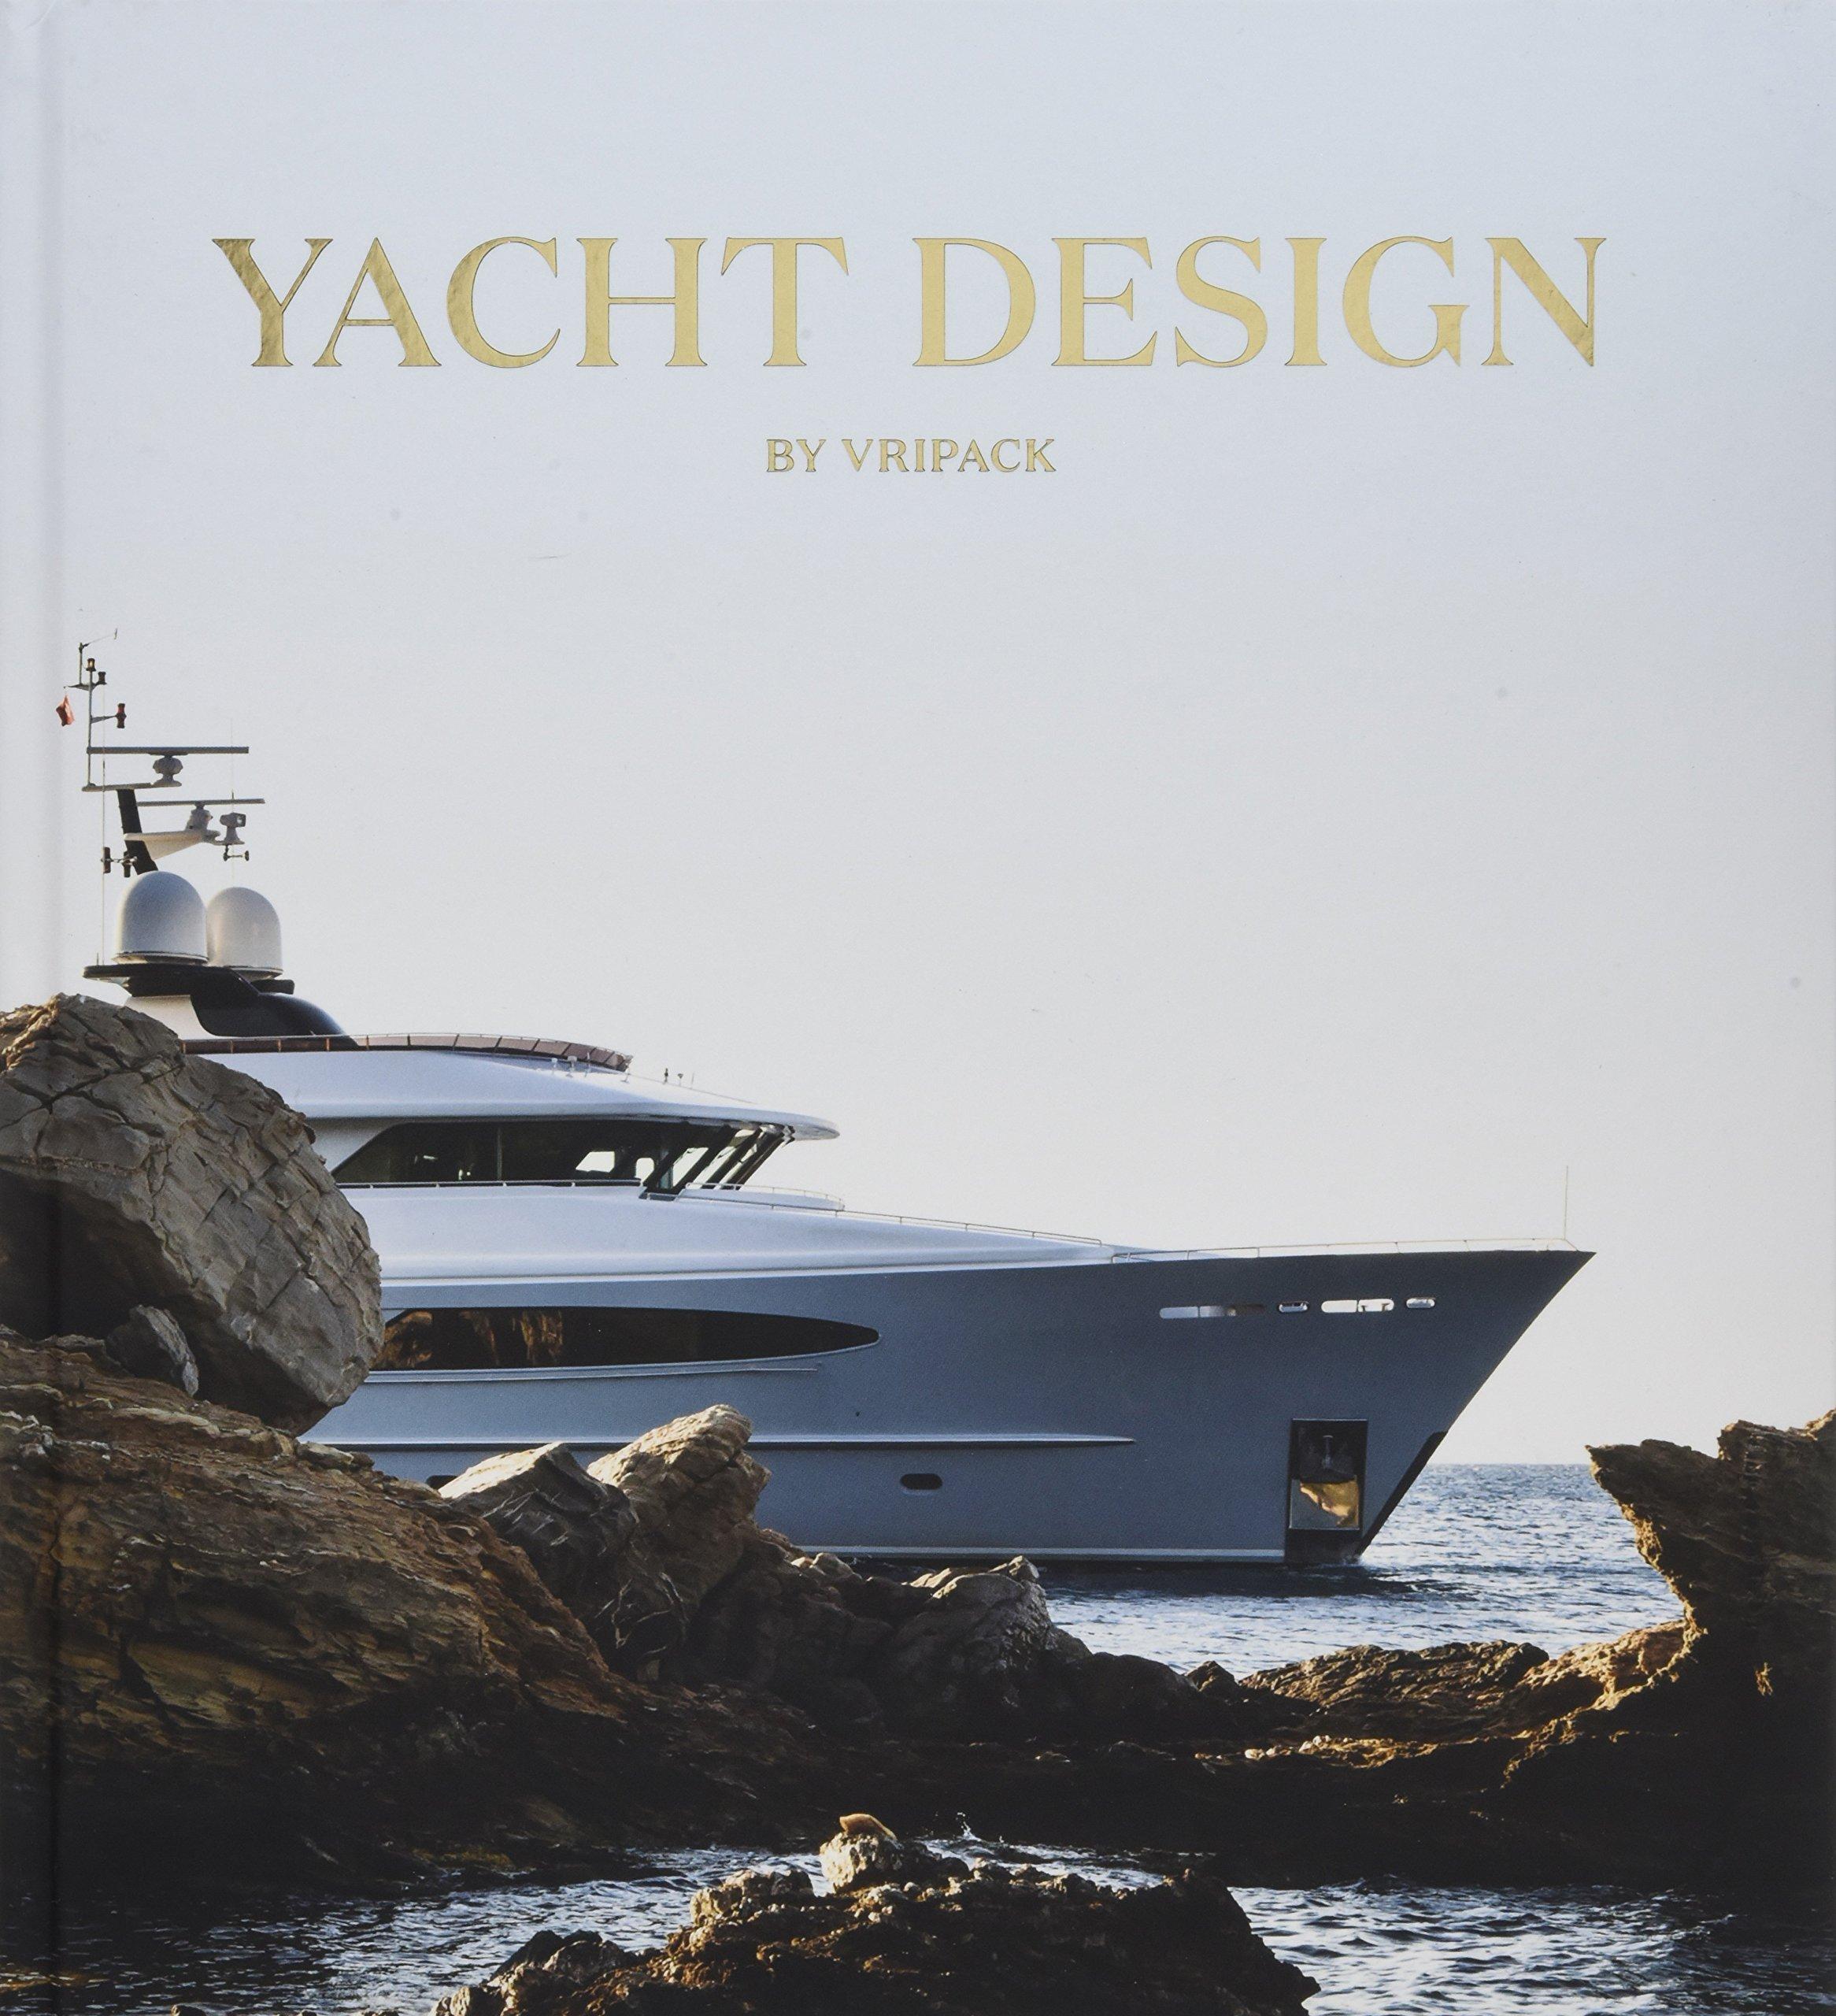 Yacht Design pdf